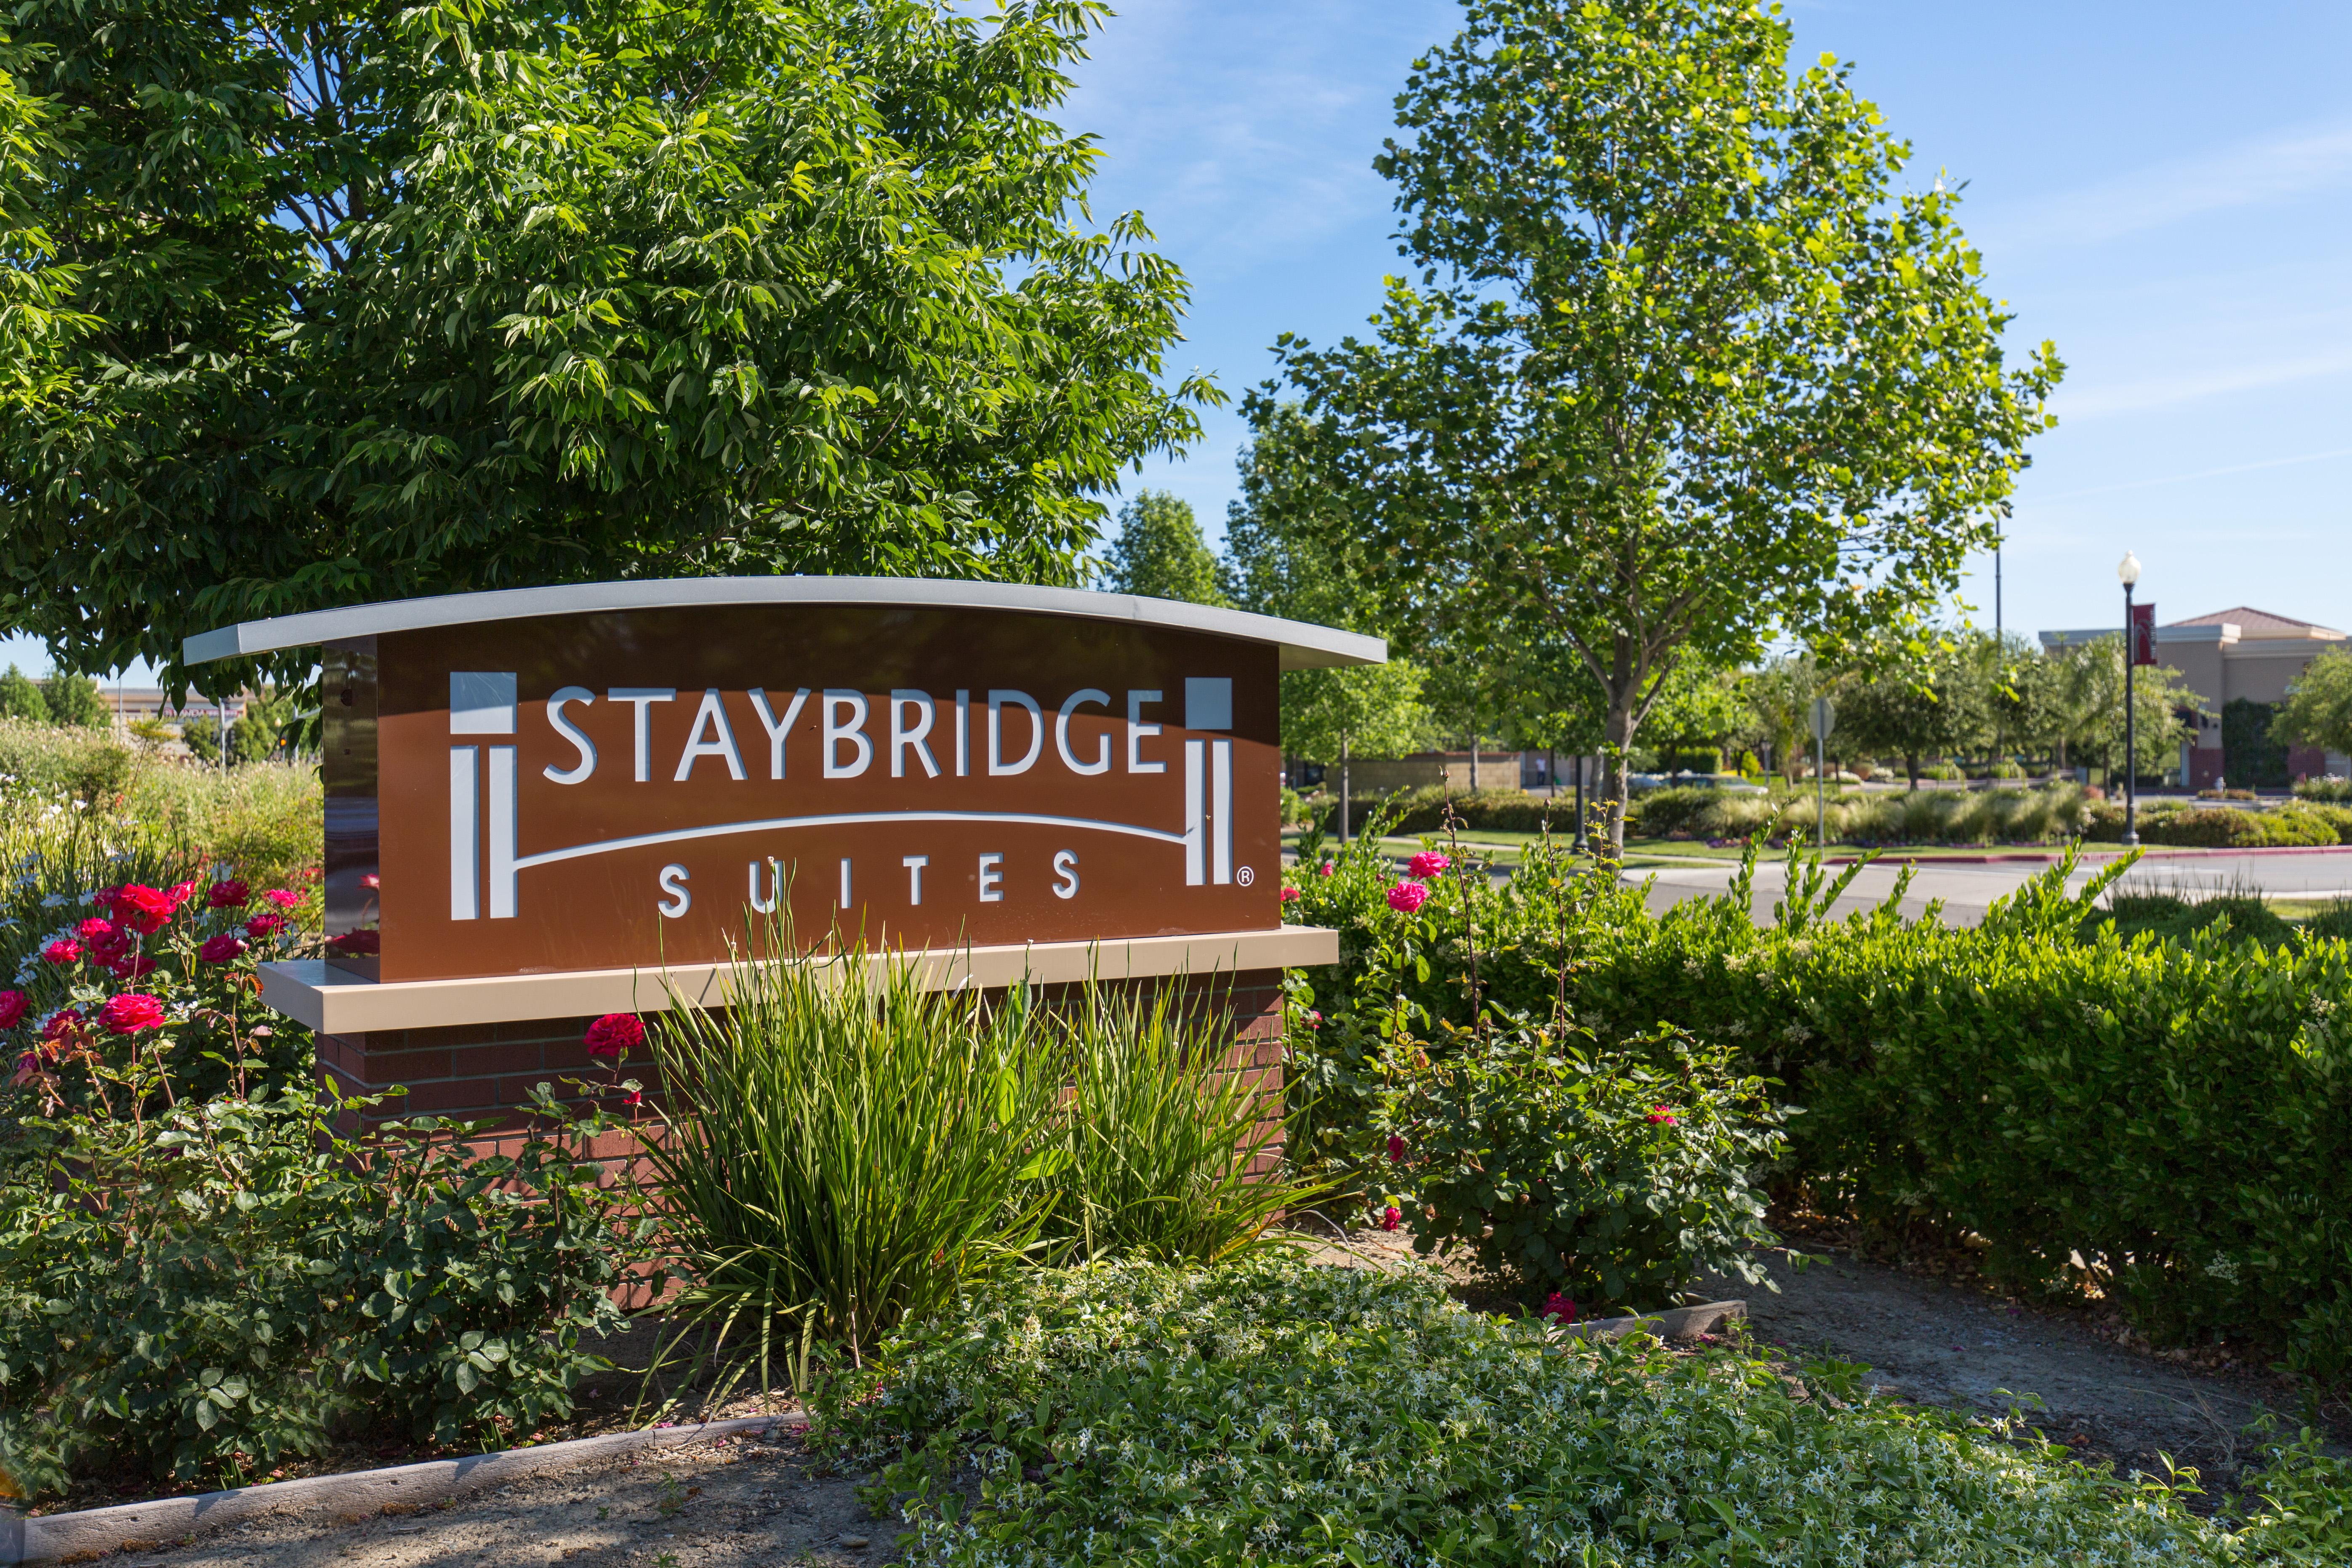 Staybridge Stes Sac Airport